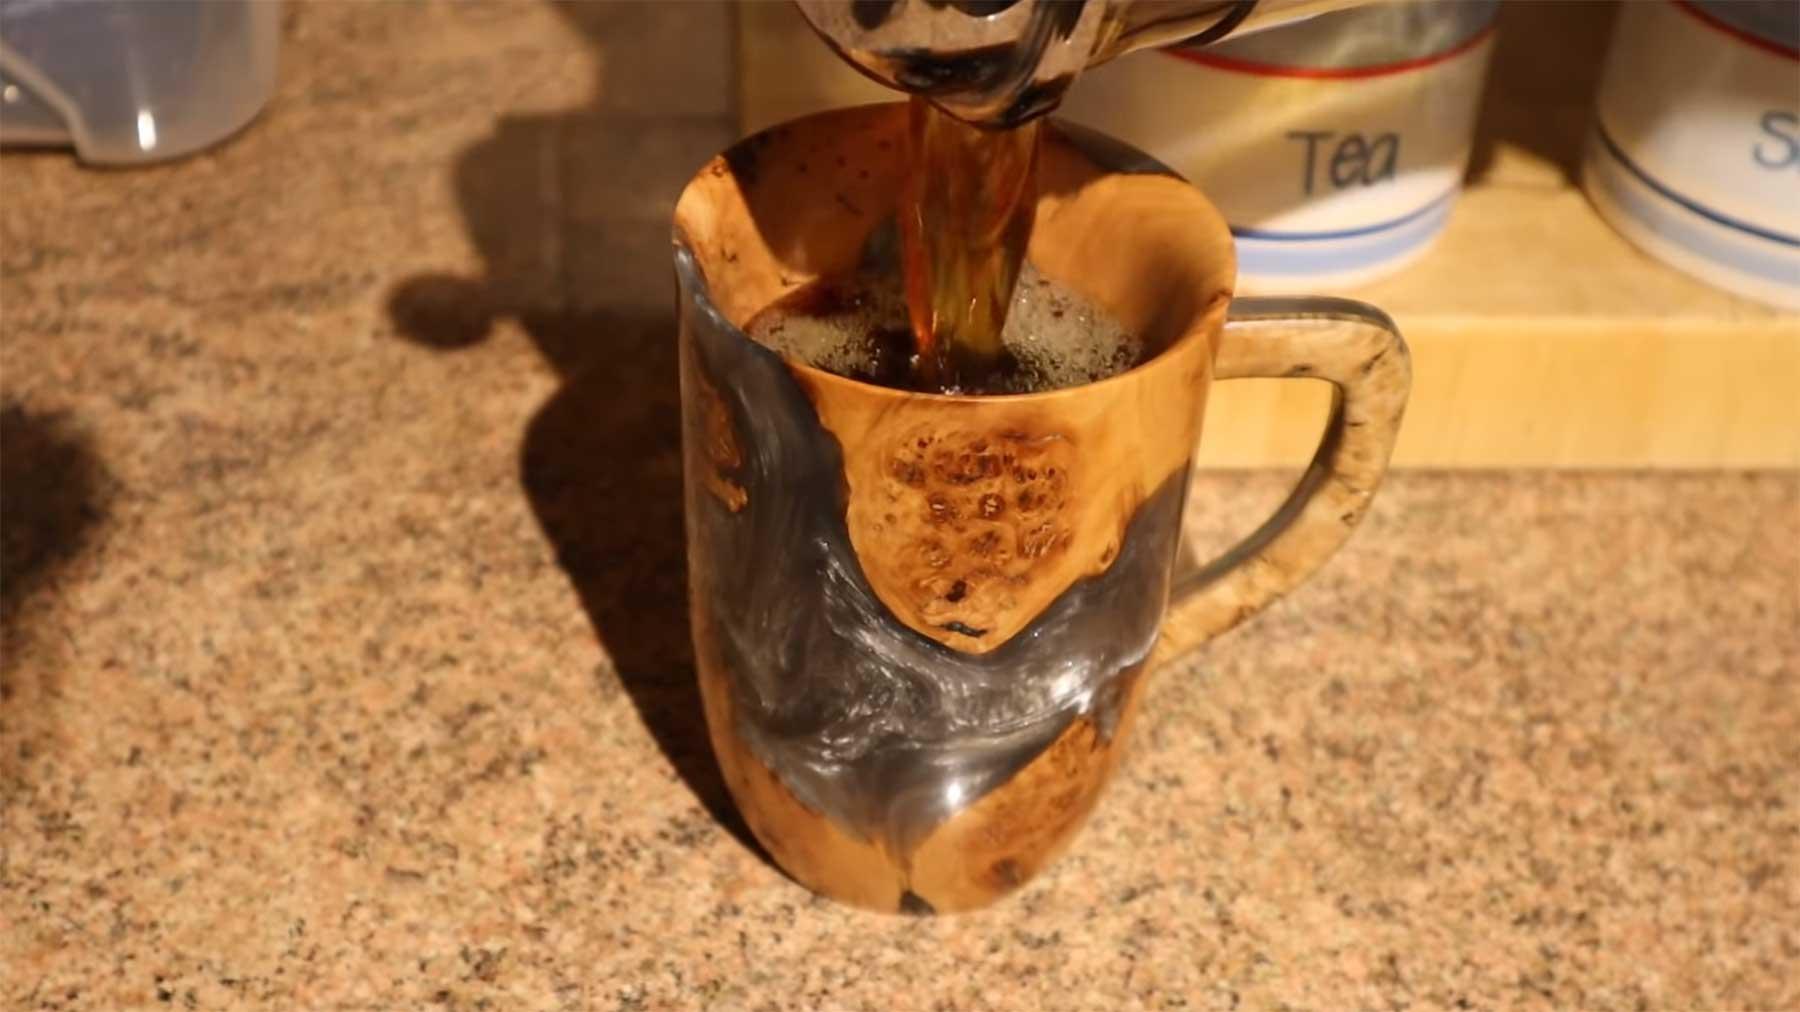 Kaffee-Tasse aus einem Stück Holz anfertigen kaffeetasse-aus-holz